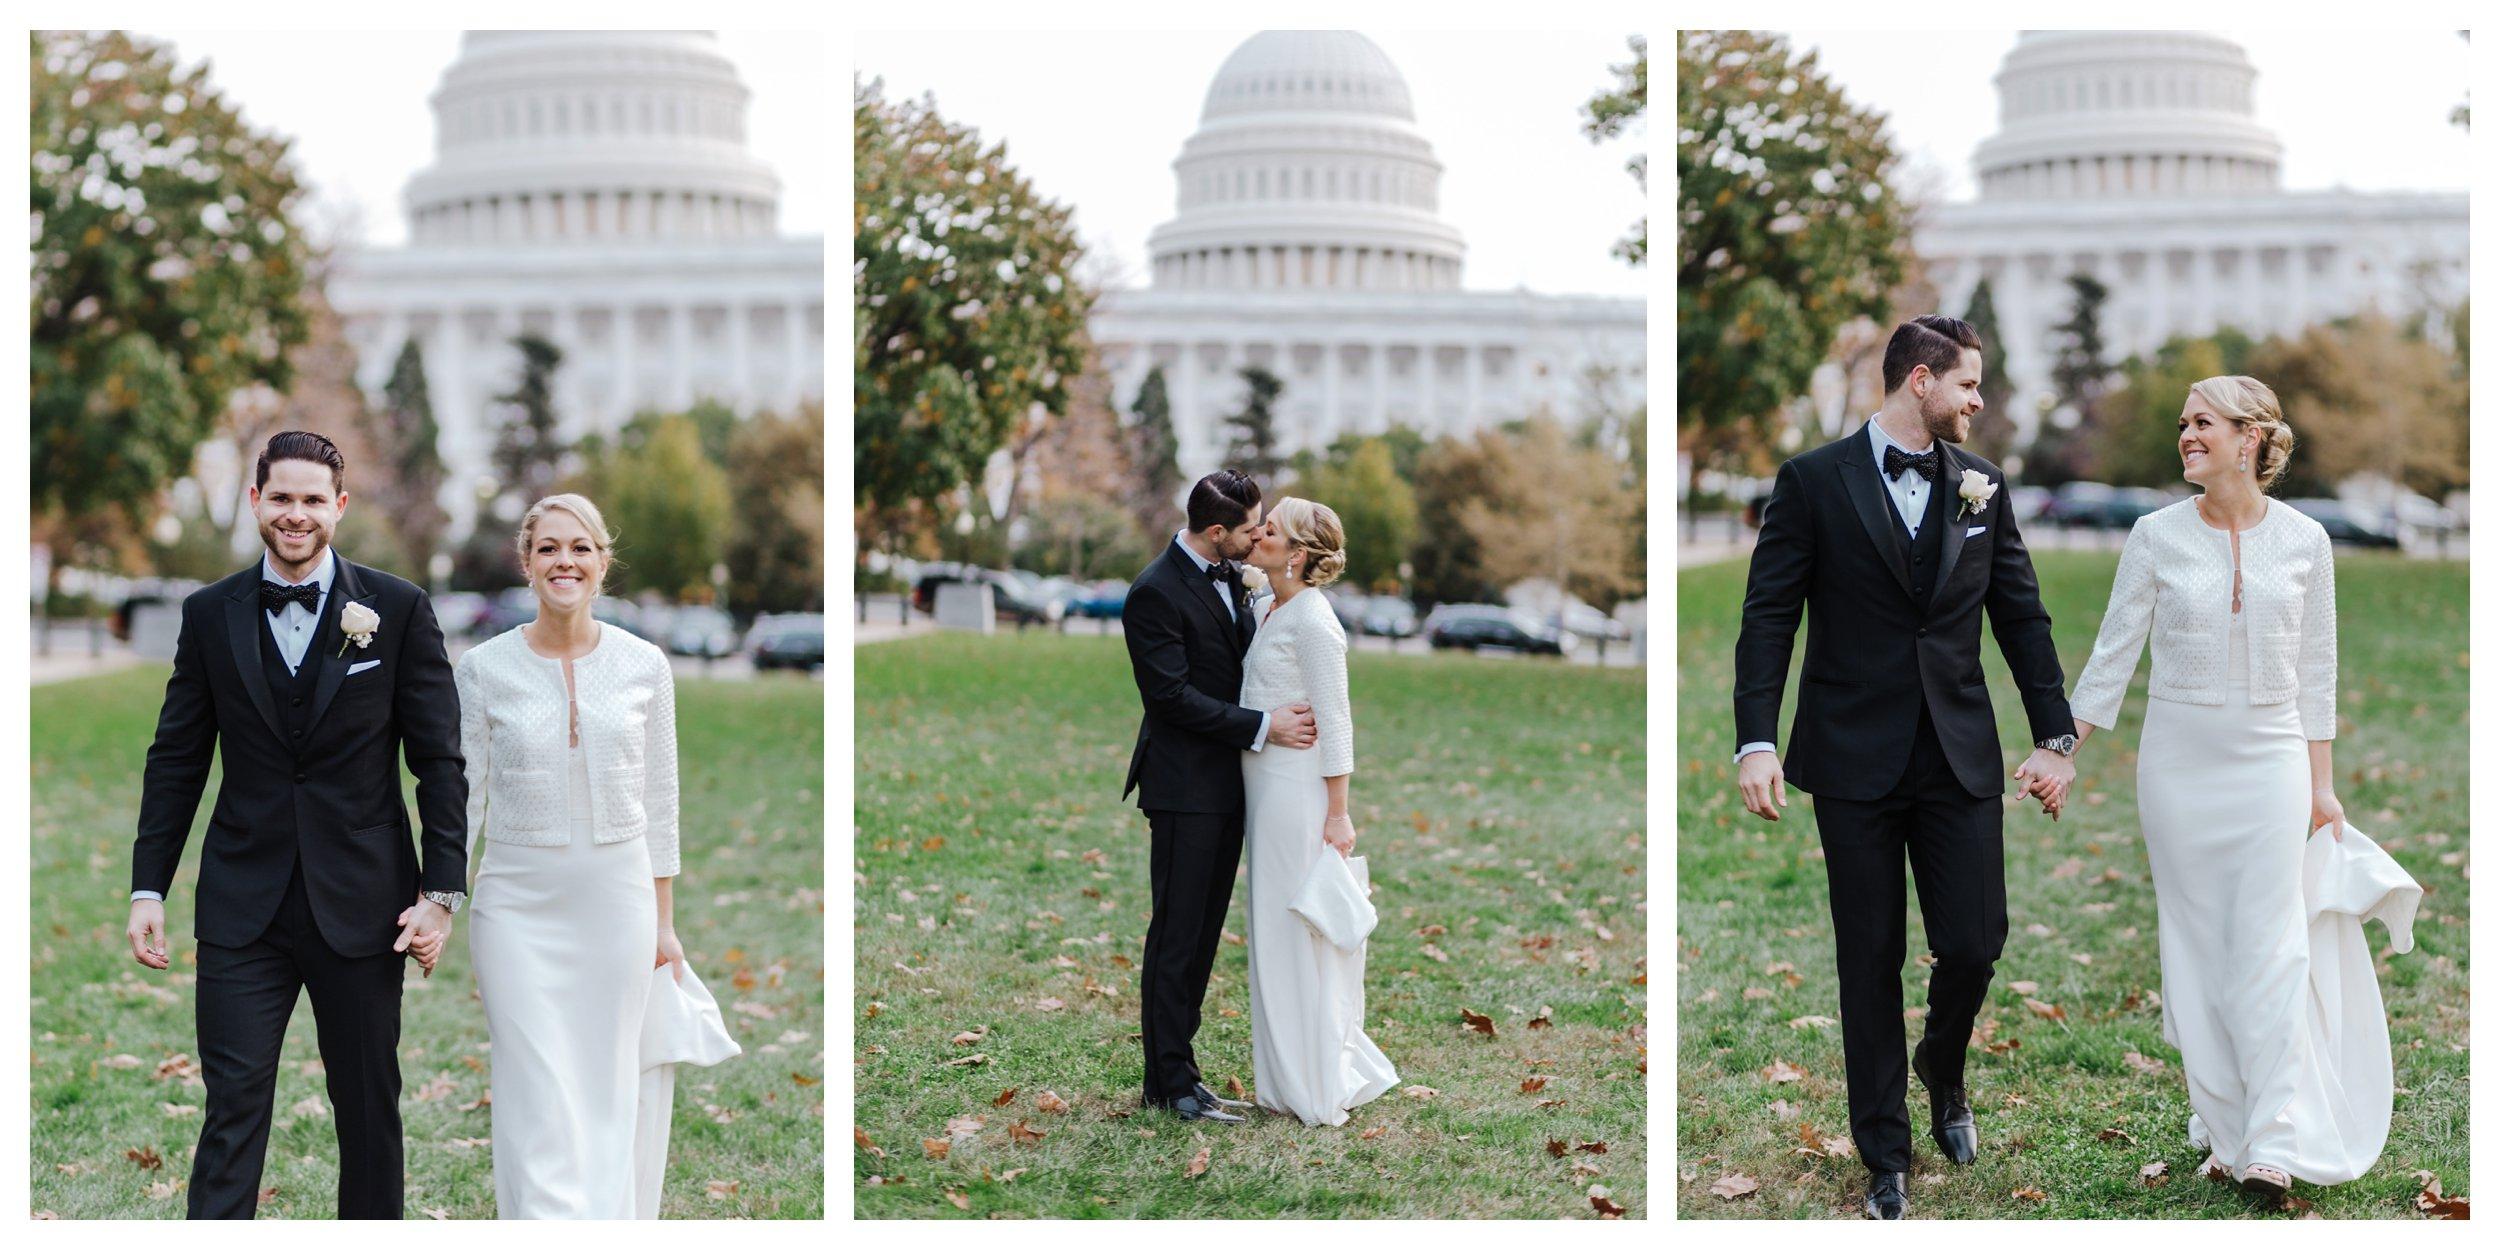 washington-dc-wedding-photographer-33.JPG